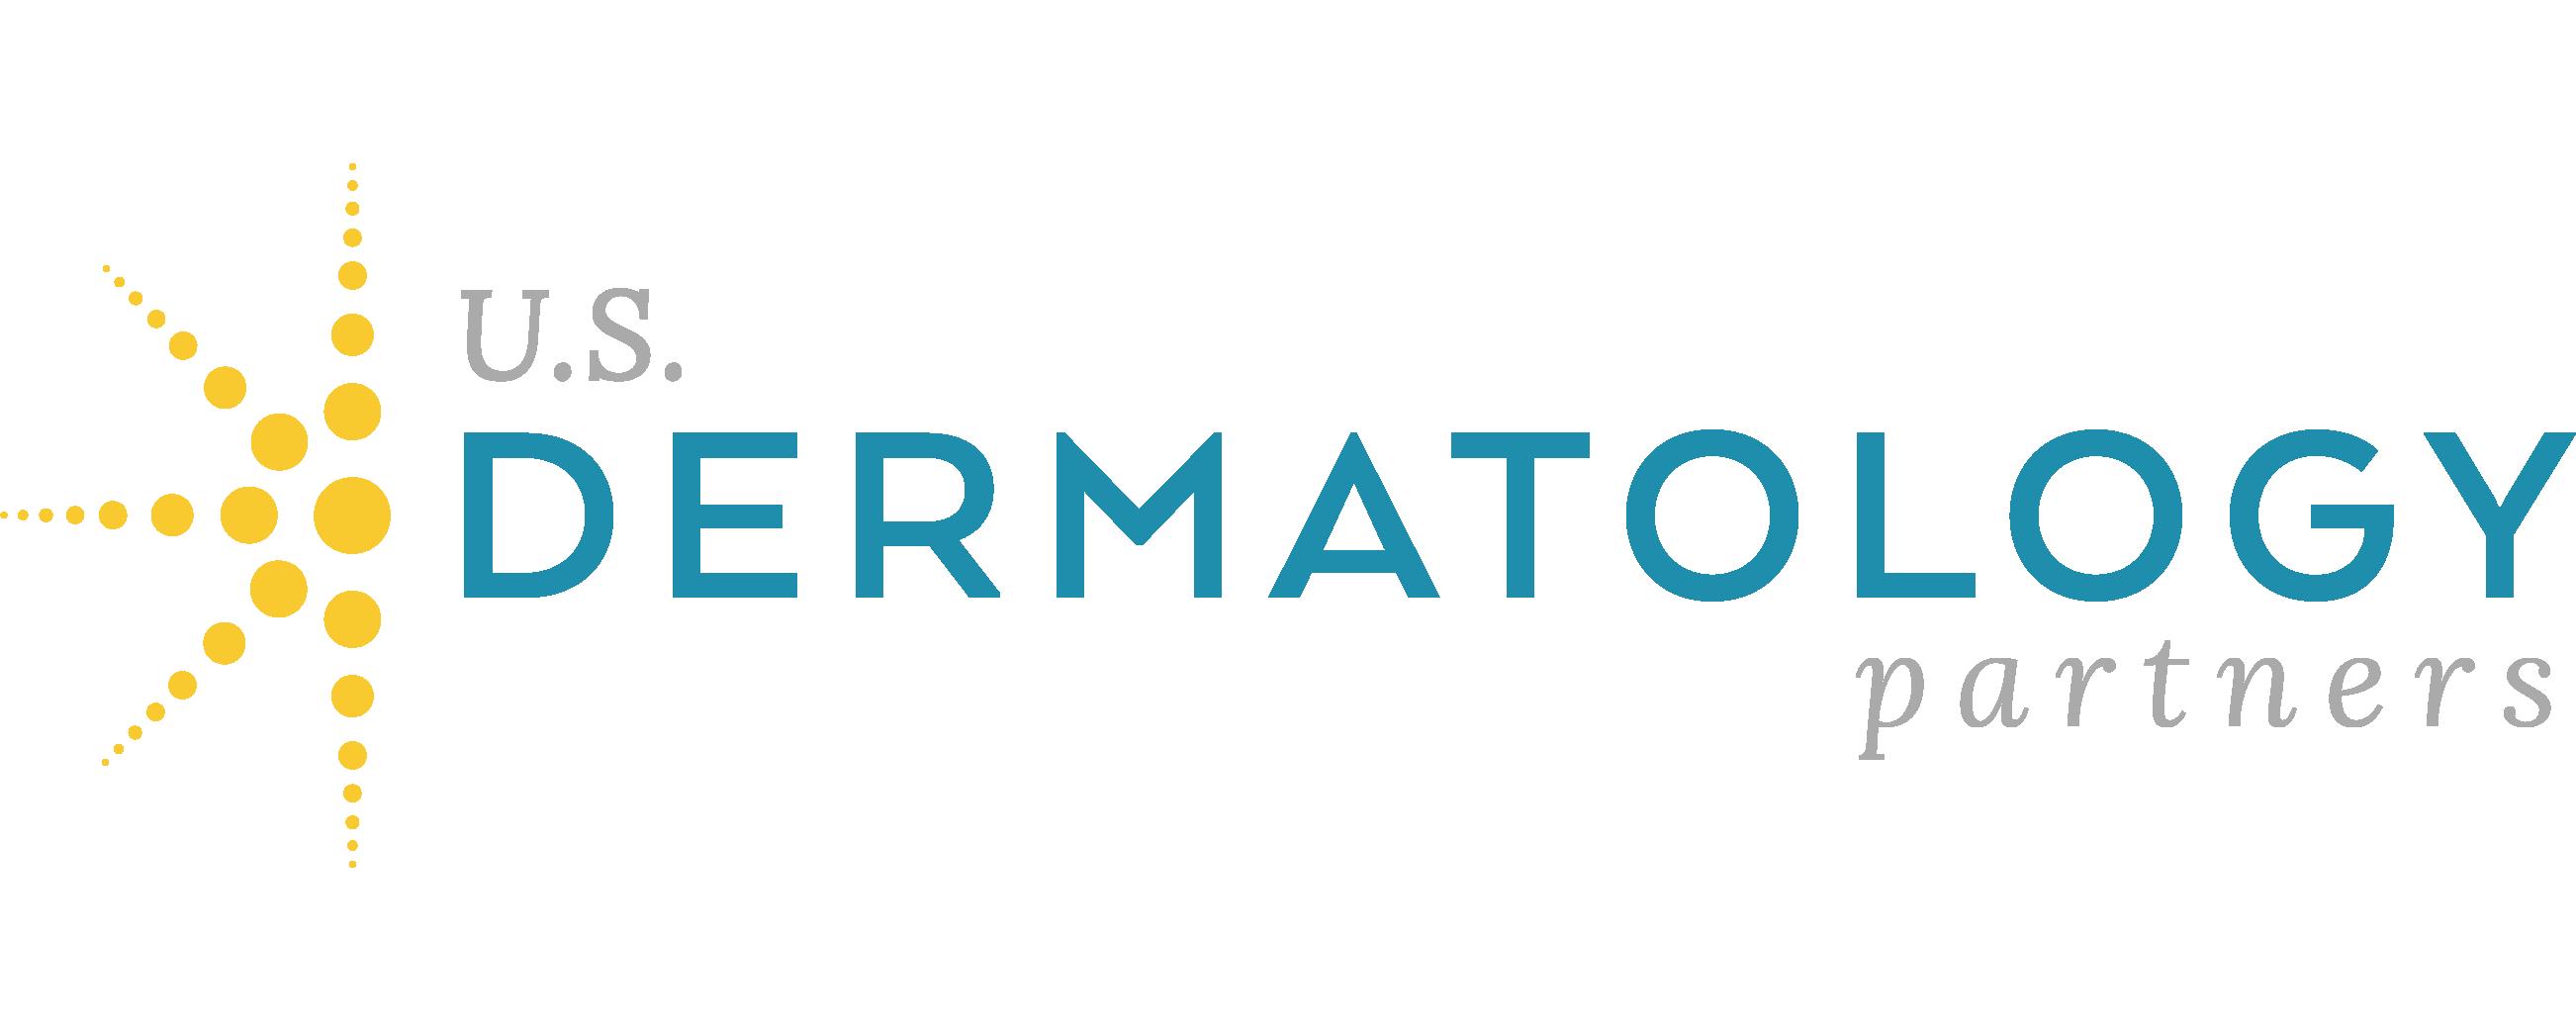 U.S. Dermatology Partners - Grapevine Logo